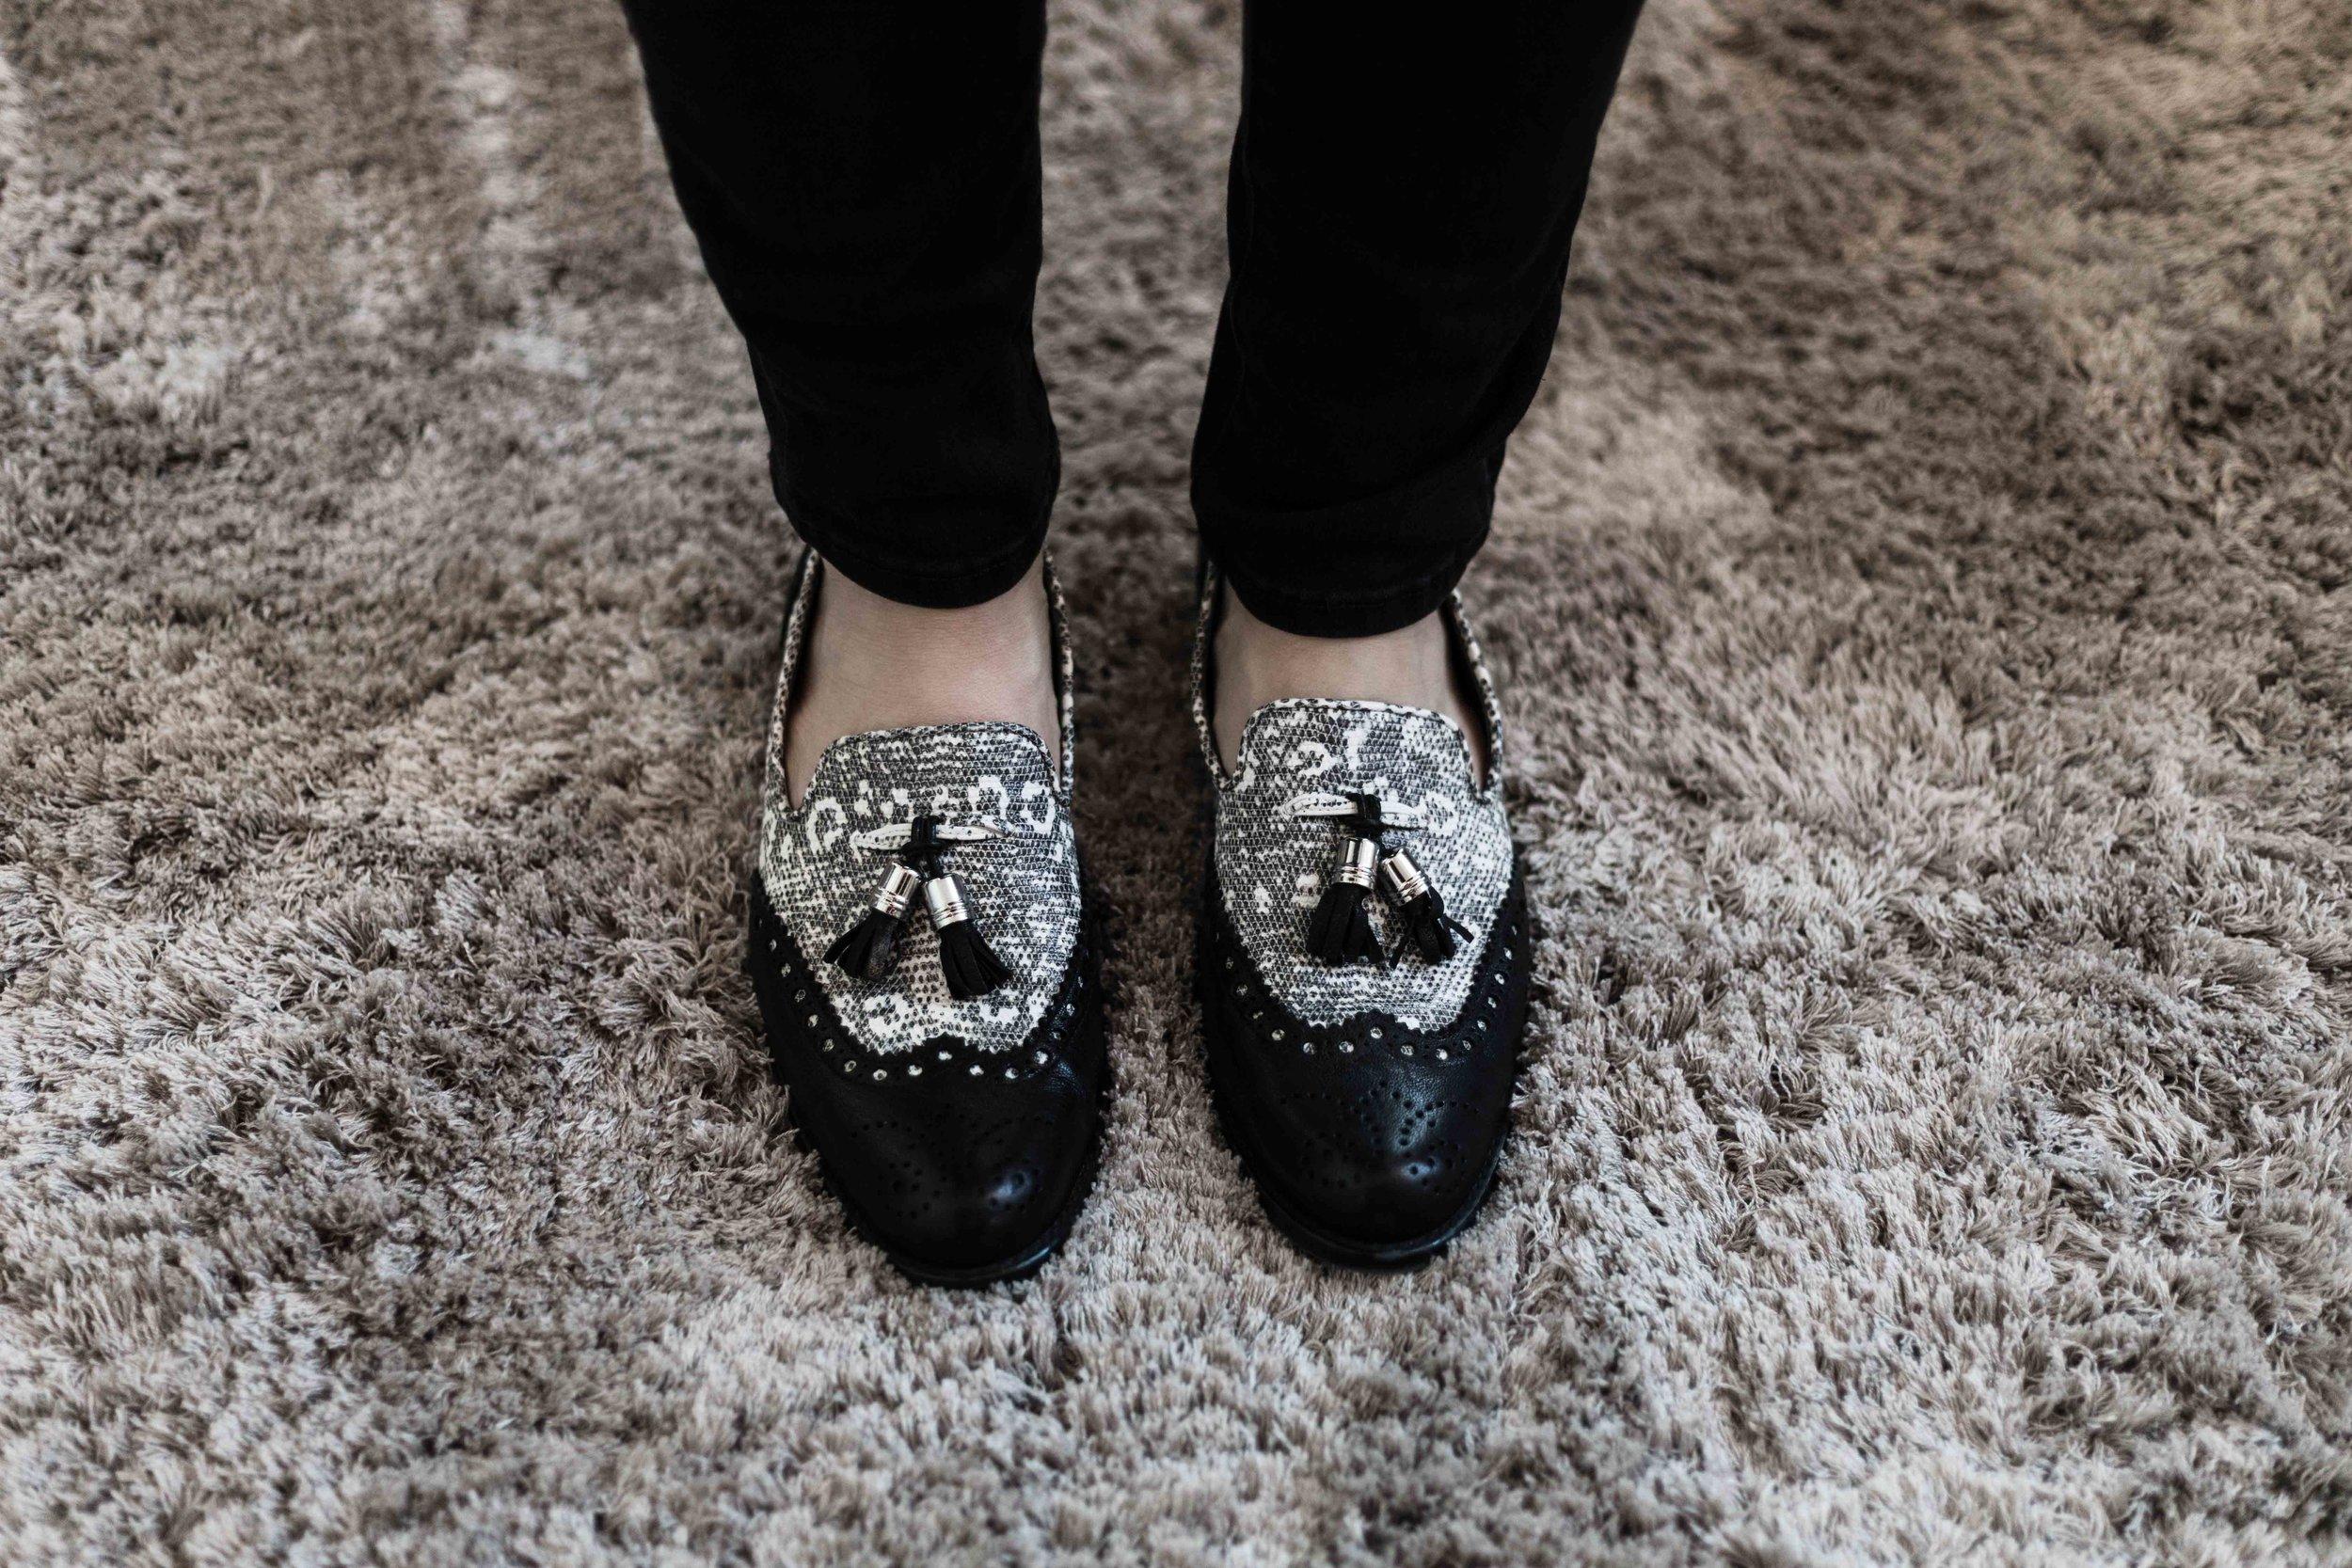 Hanna Lee Style, Chicago stylist interviewed by photographer Katharine Hannah